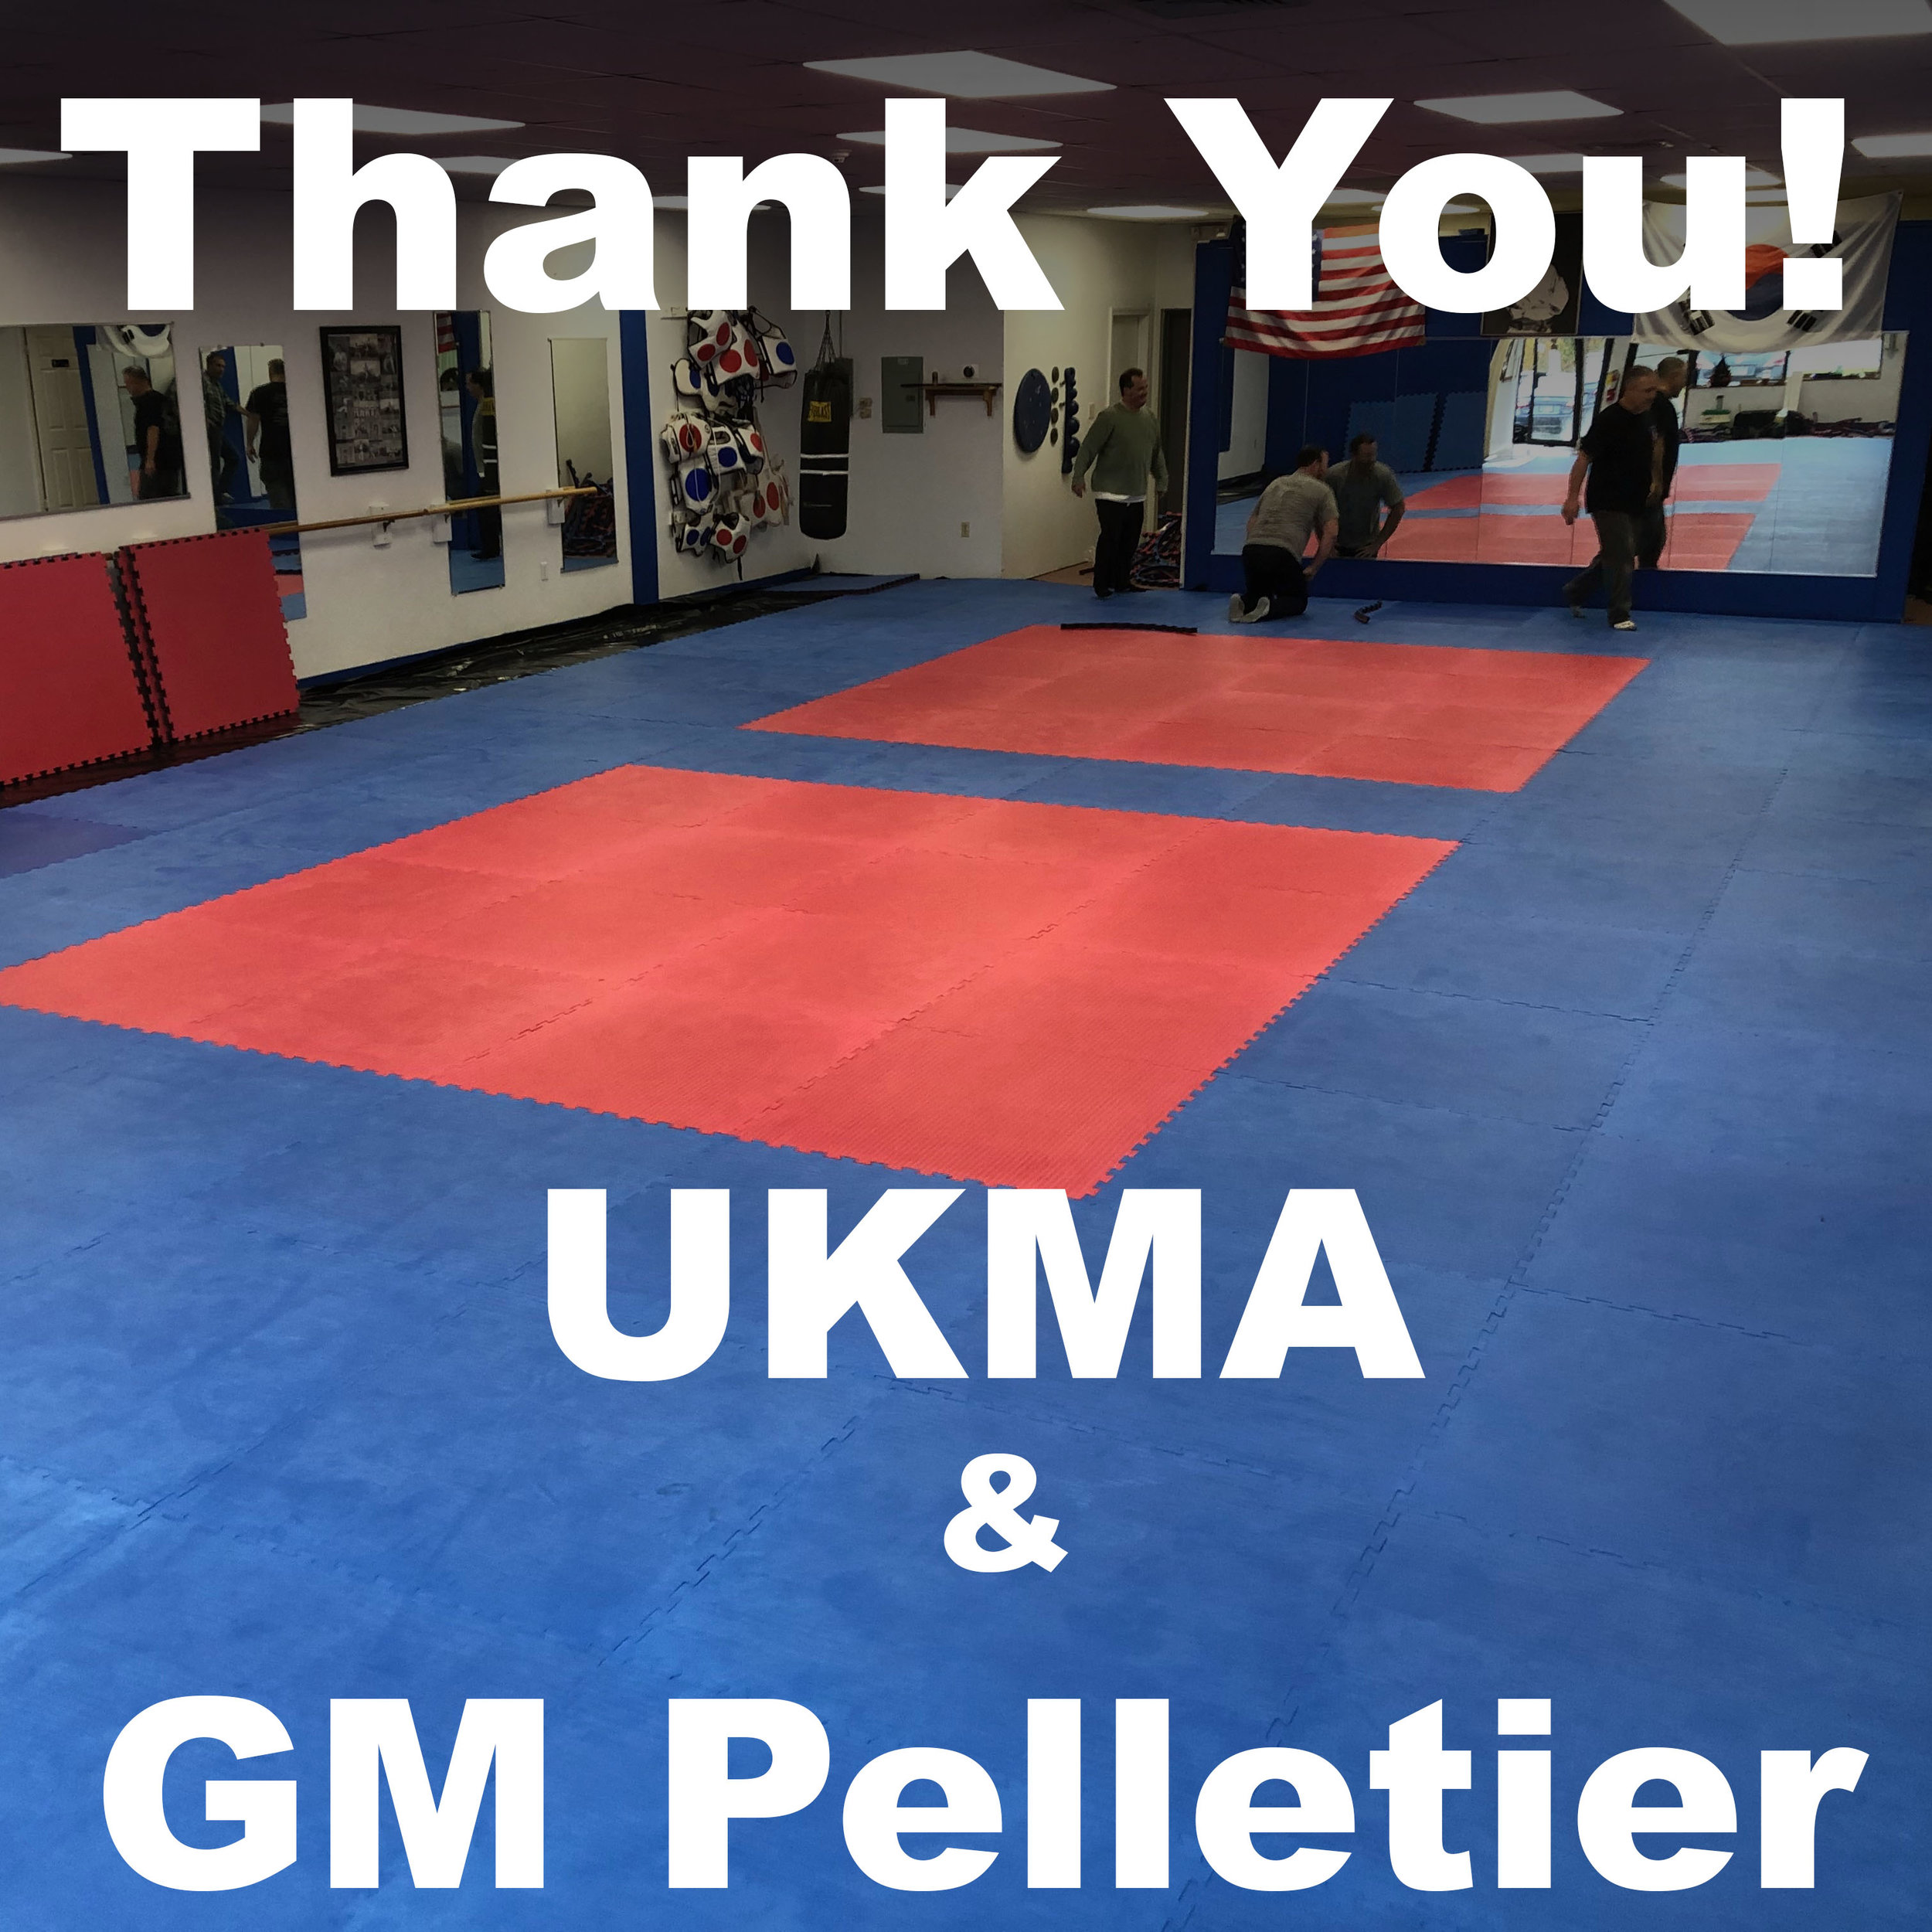 United Korean Martial Arts & GM Pelletier